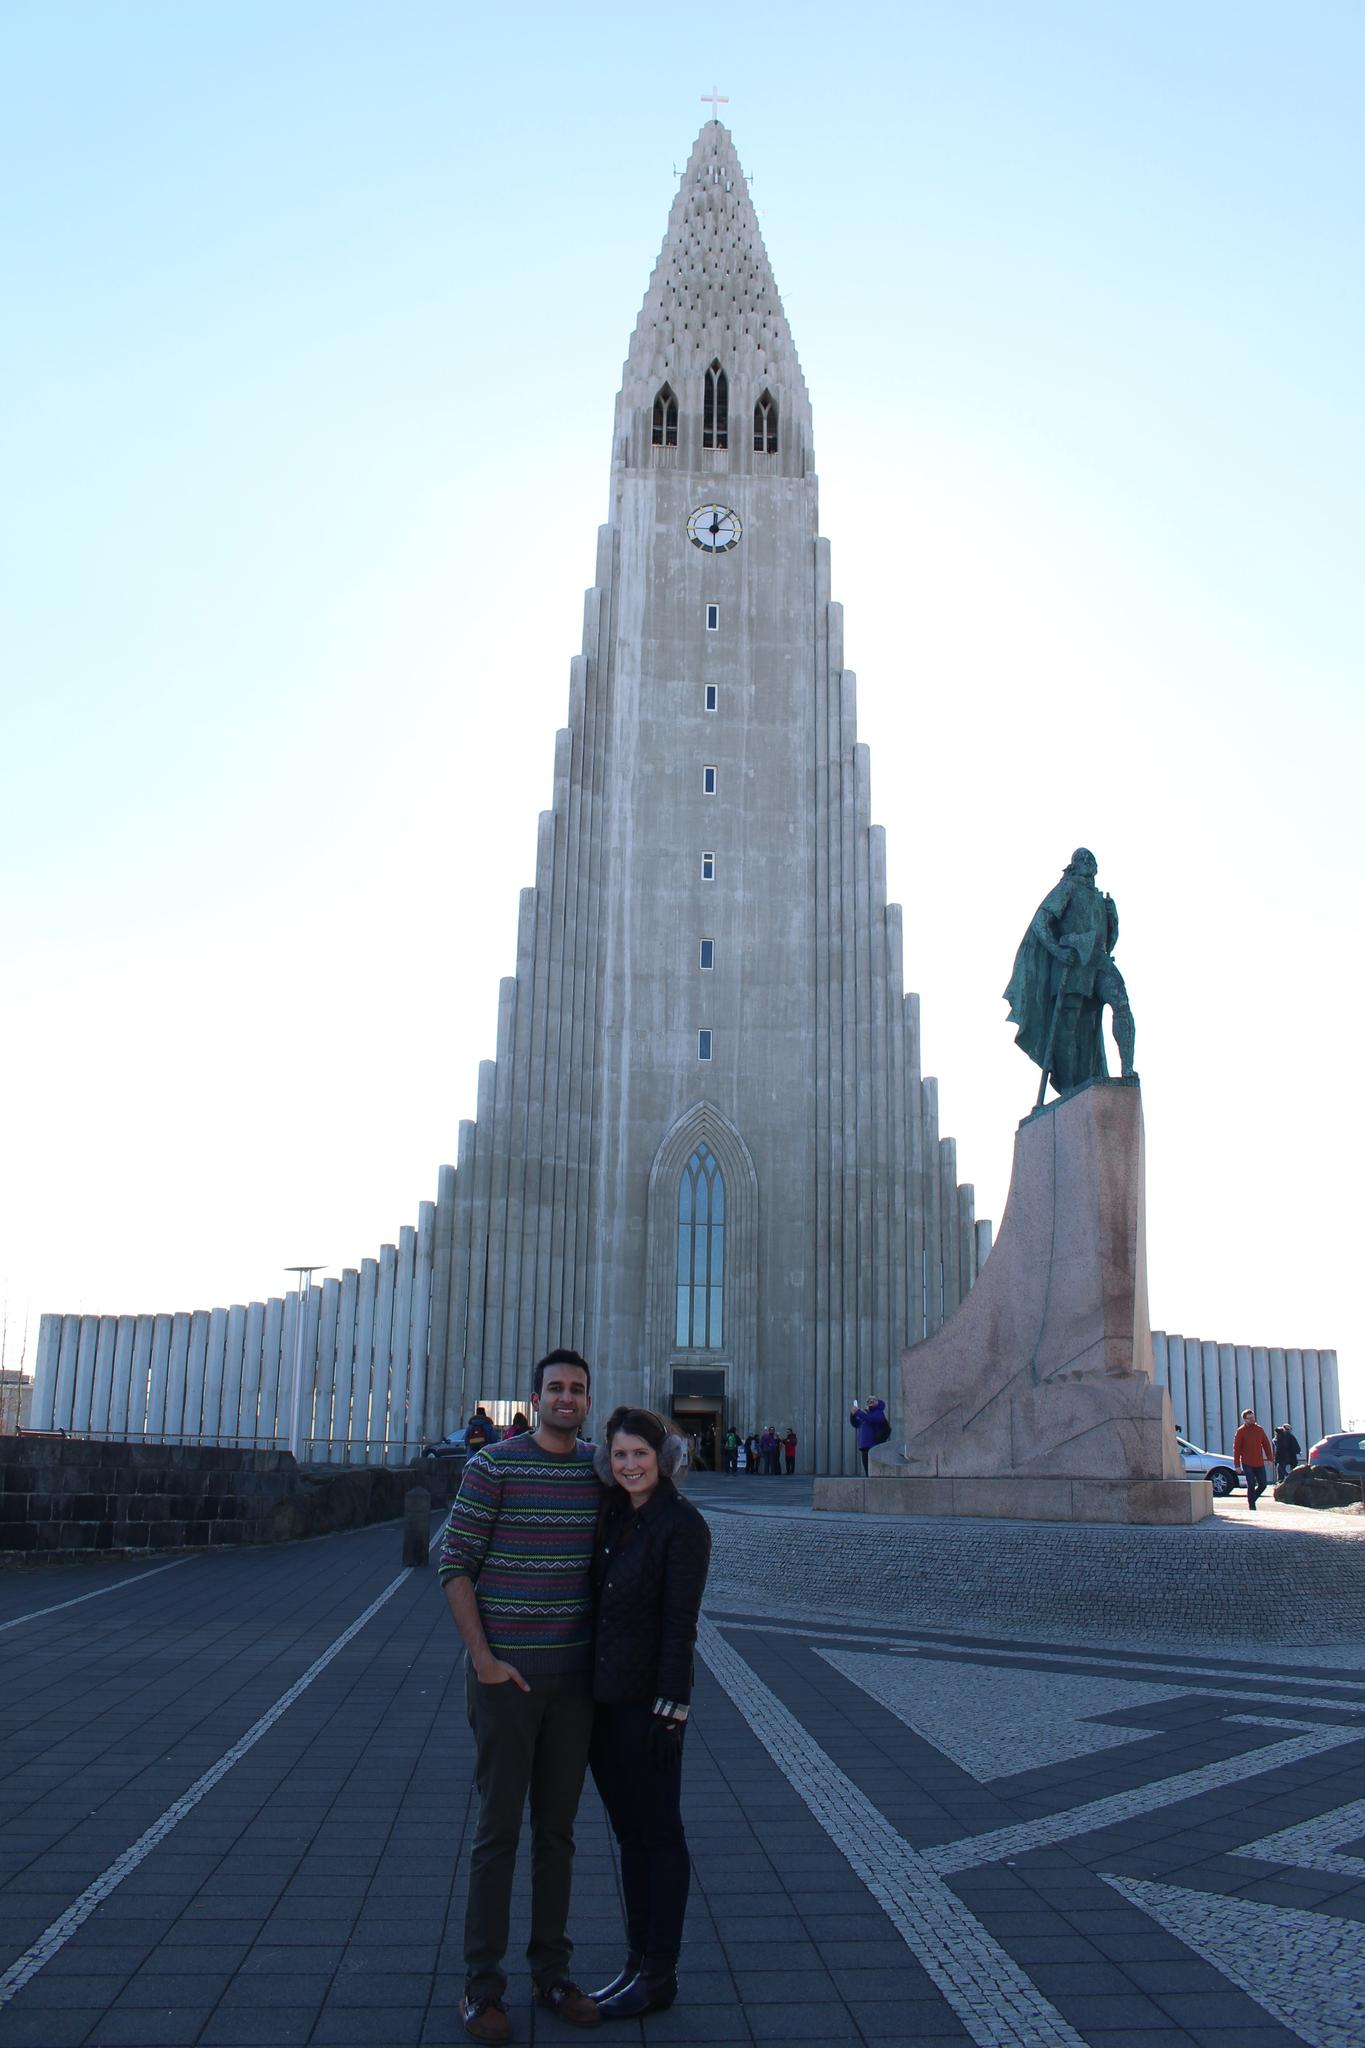 Hallgrímskirkja church is so unique, looming over Reykjavik